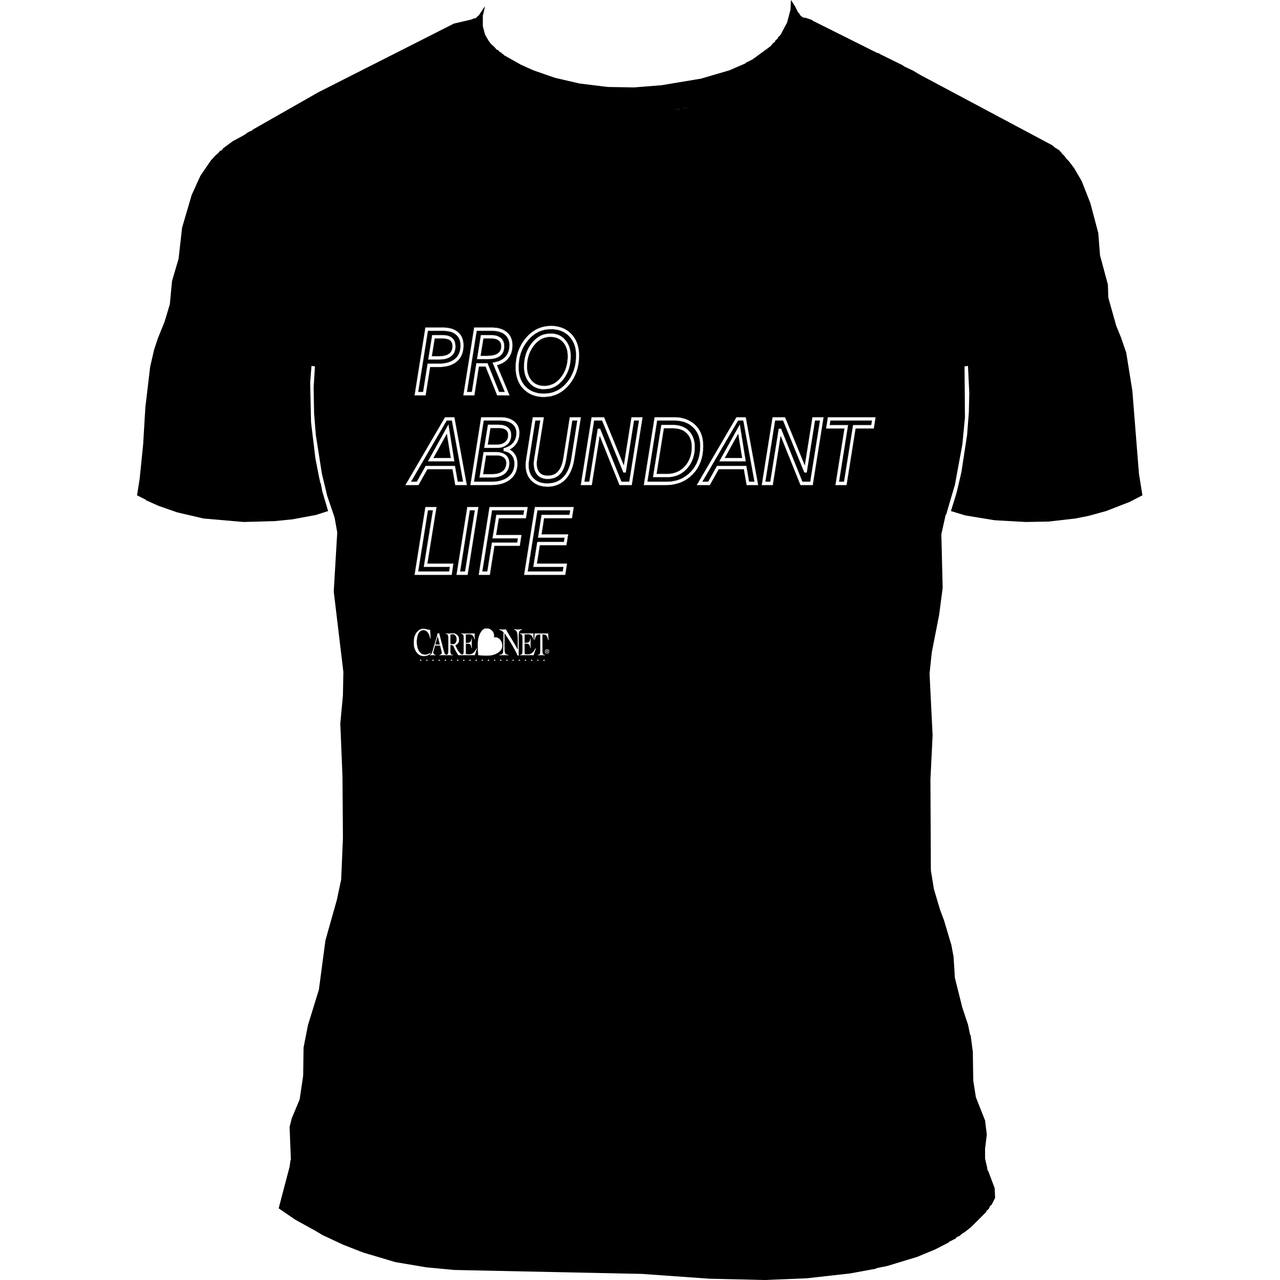 Pro Abundant Life T-Shirt